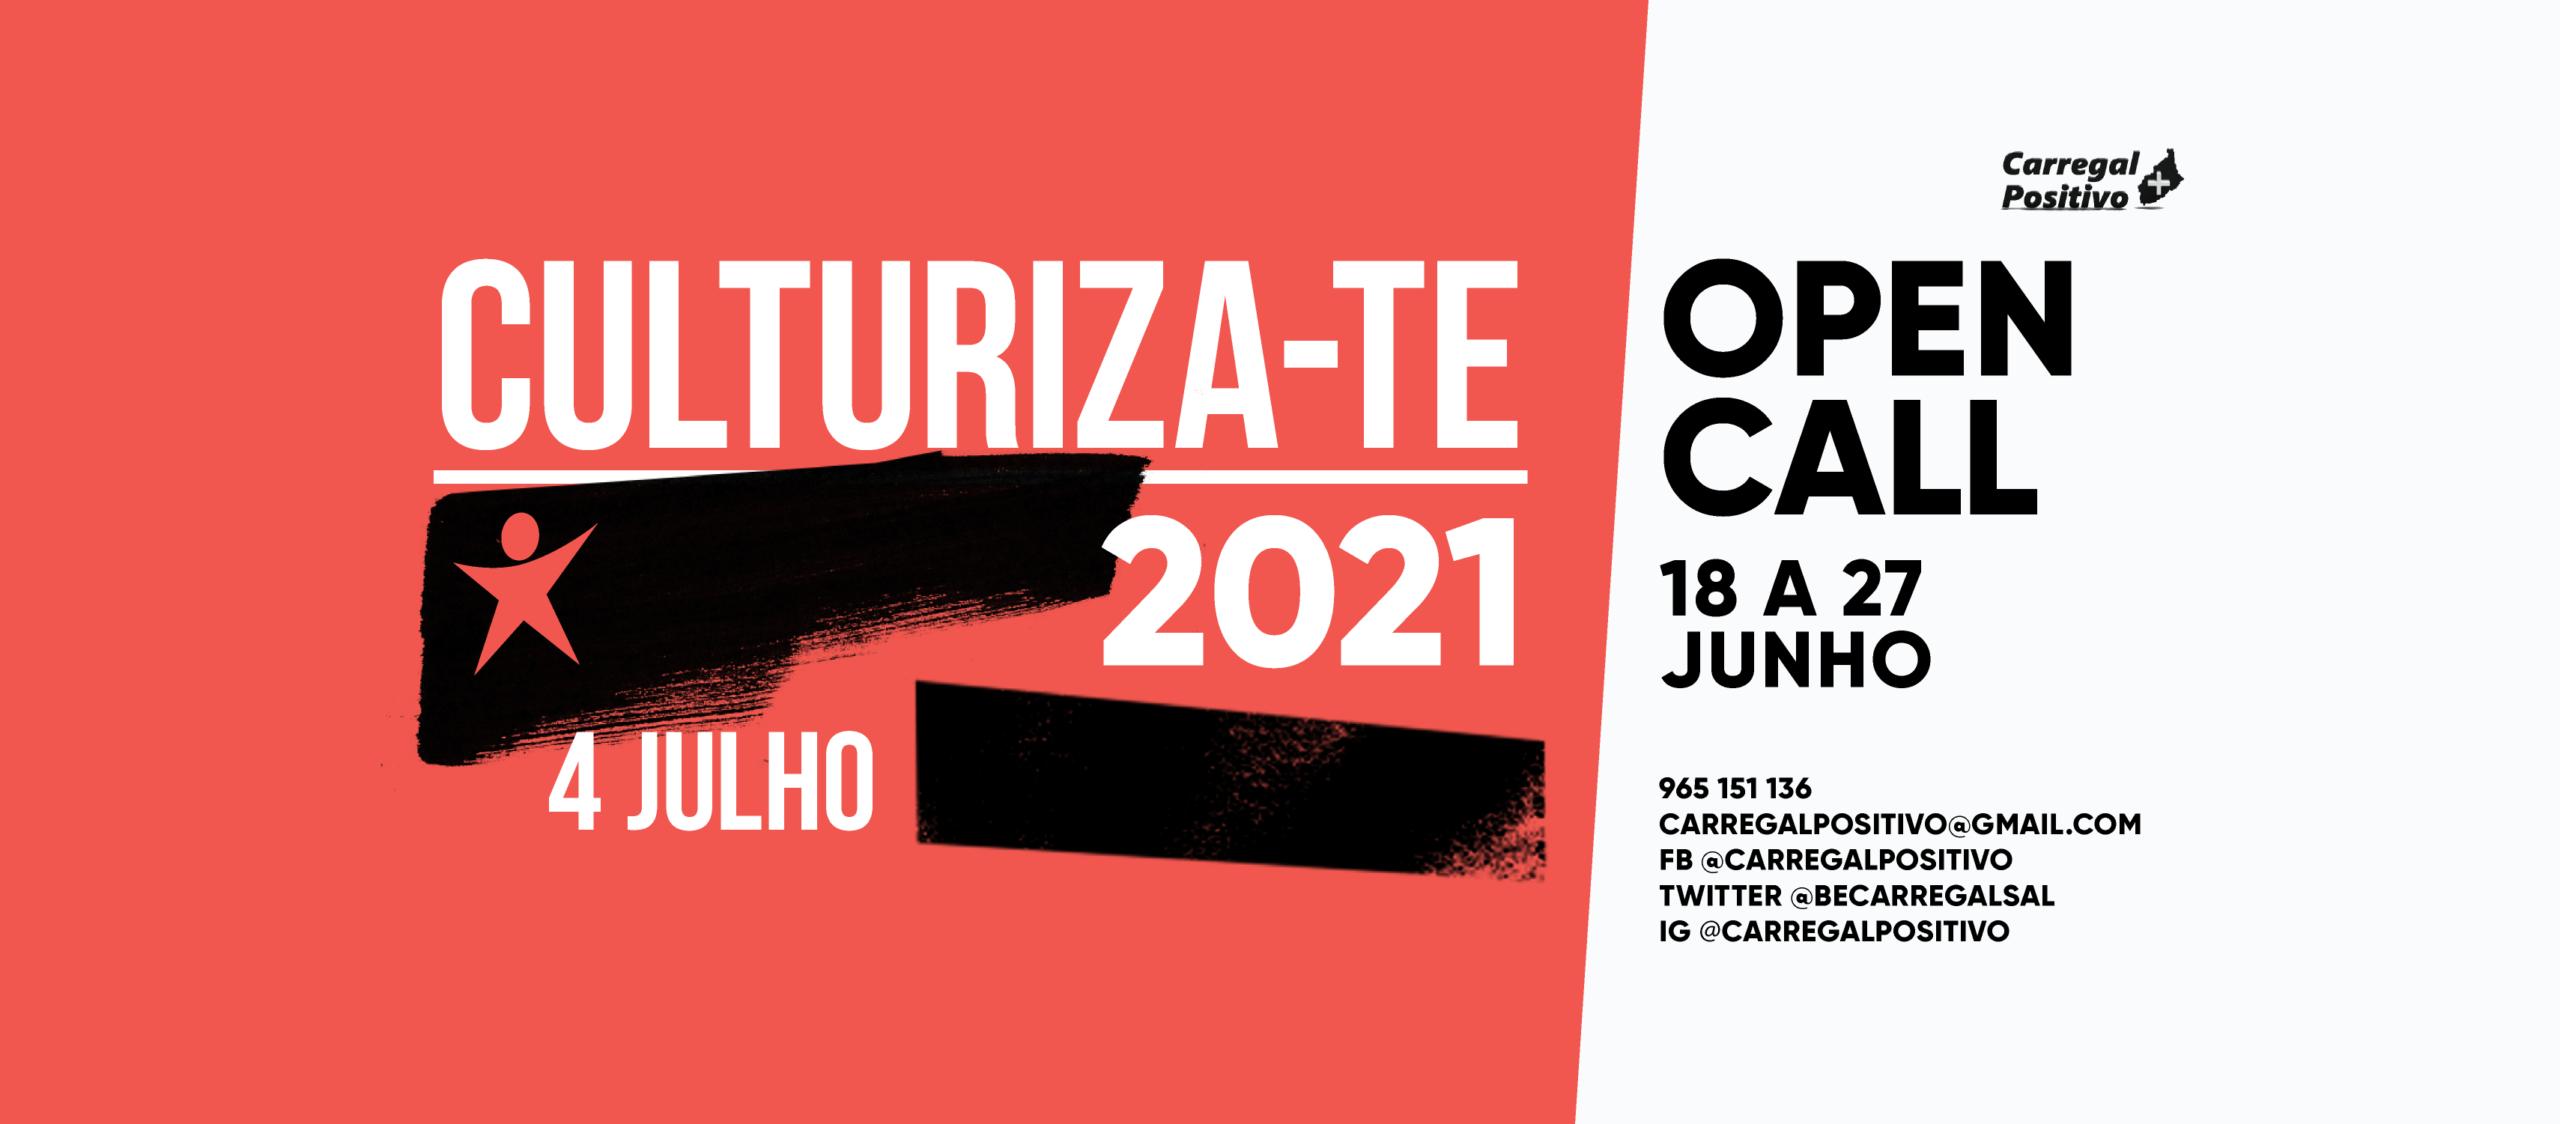 Culturiza-te 2021: Open Call até 27 de junho